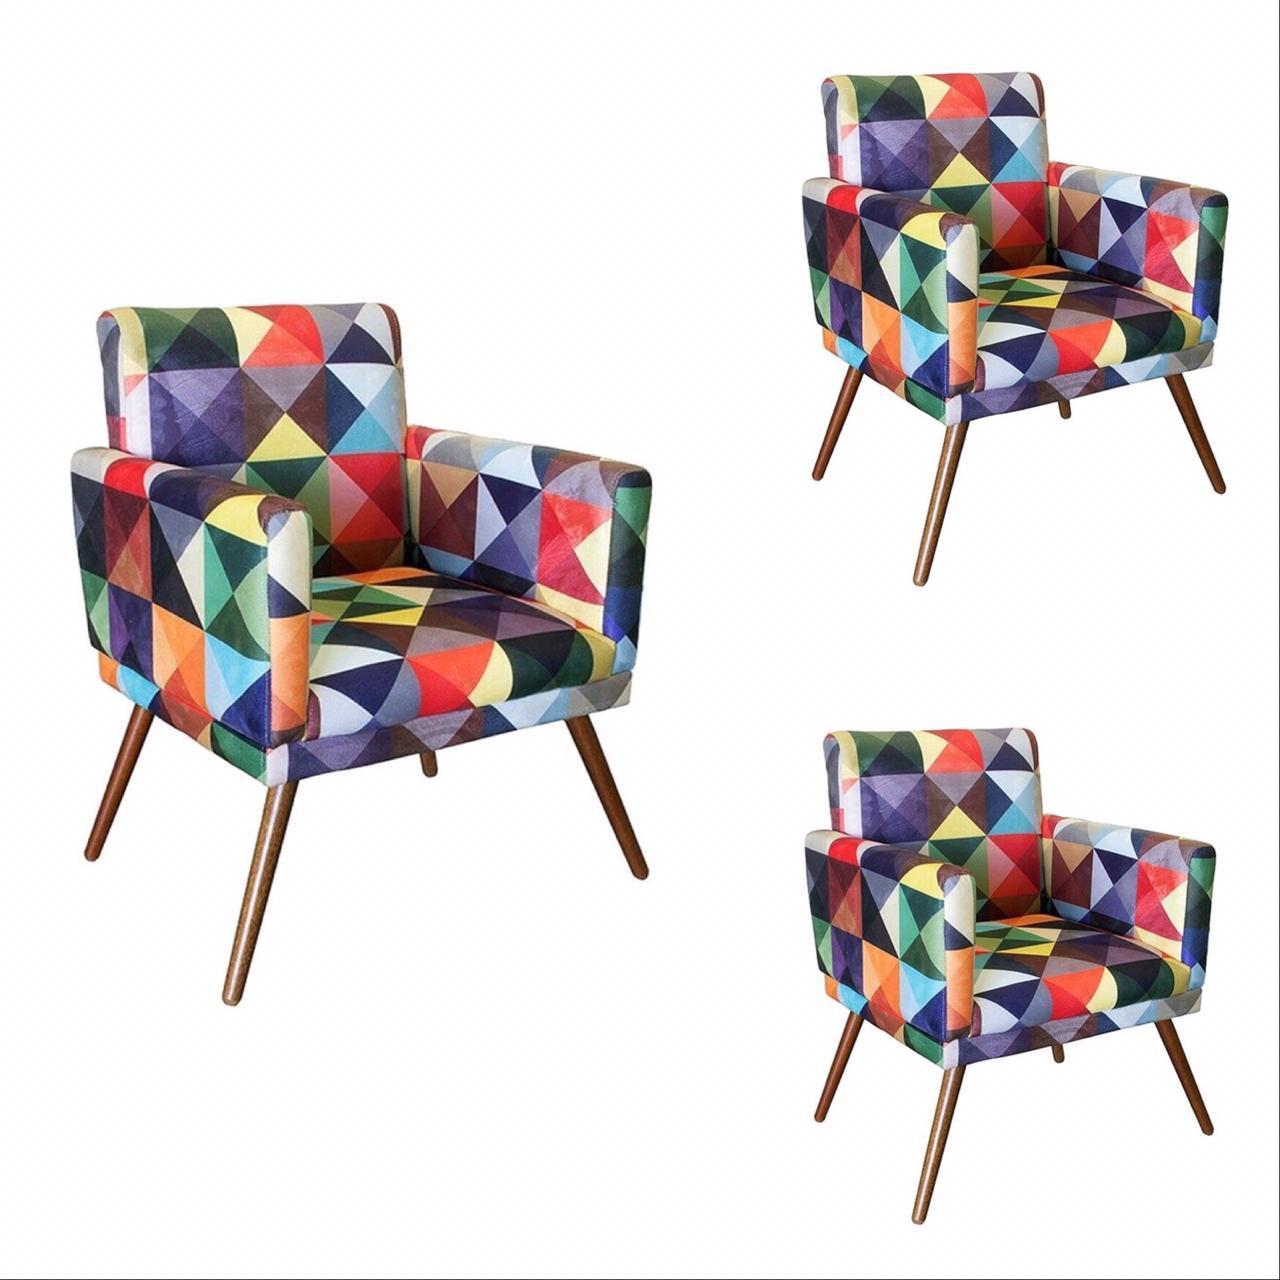 Kit 03 Poltrona Decorativa Nina com rodapé Triângulos- Bela Casa Shop